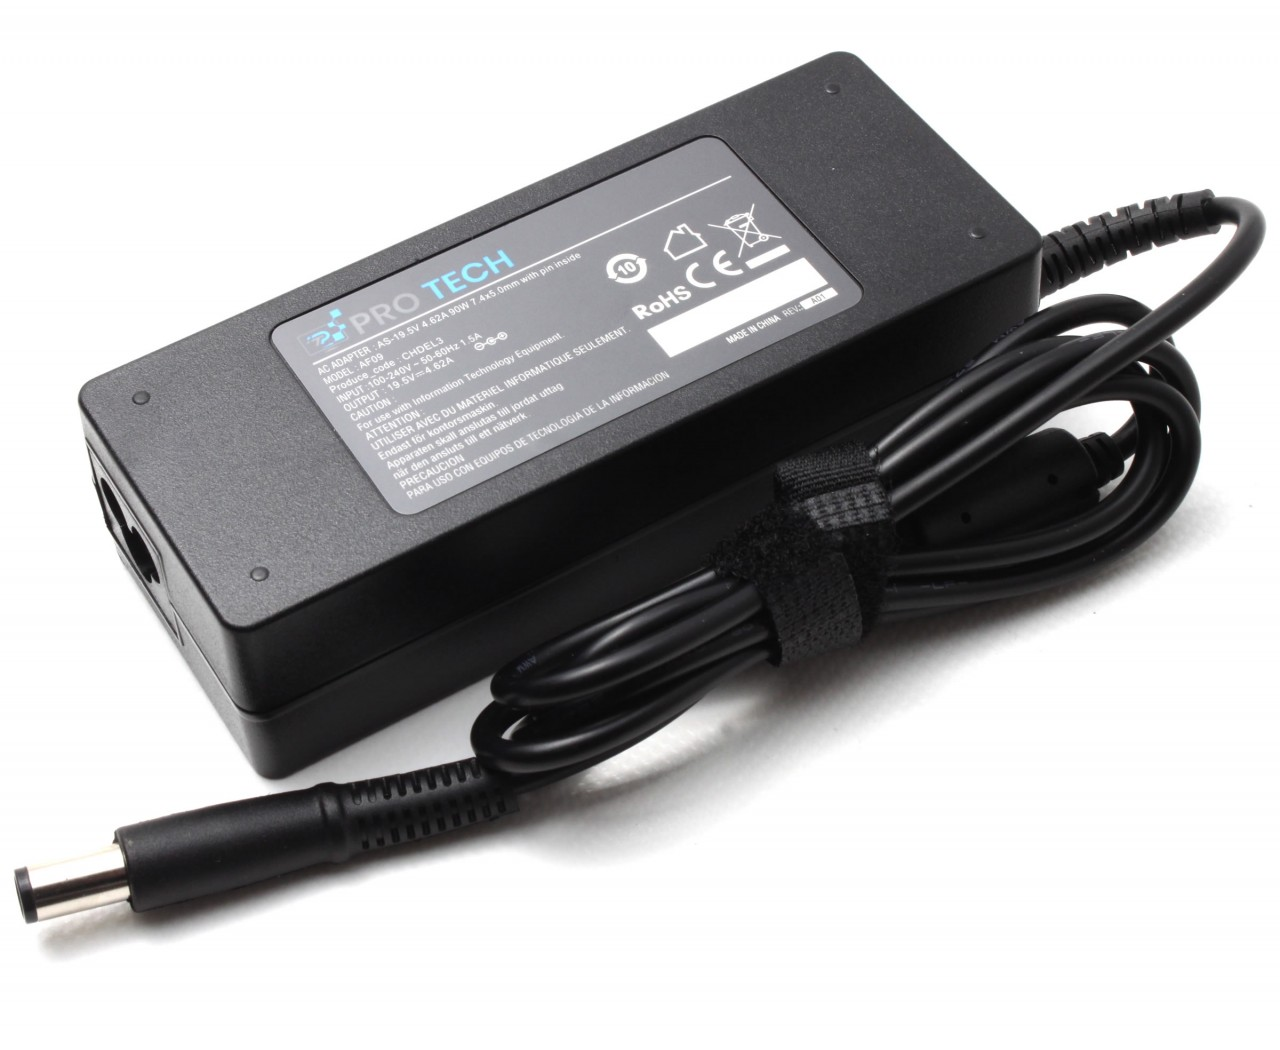 Incarcator Dell Vostro V13 Replacement imagine powerlaptop.ro 2021